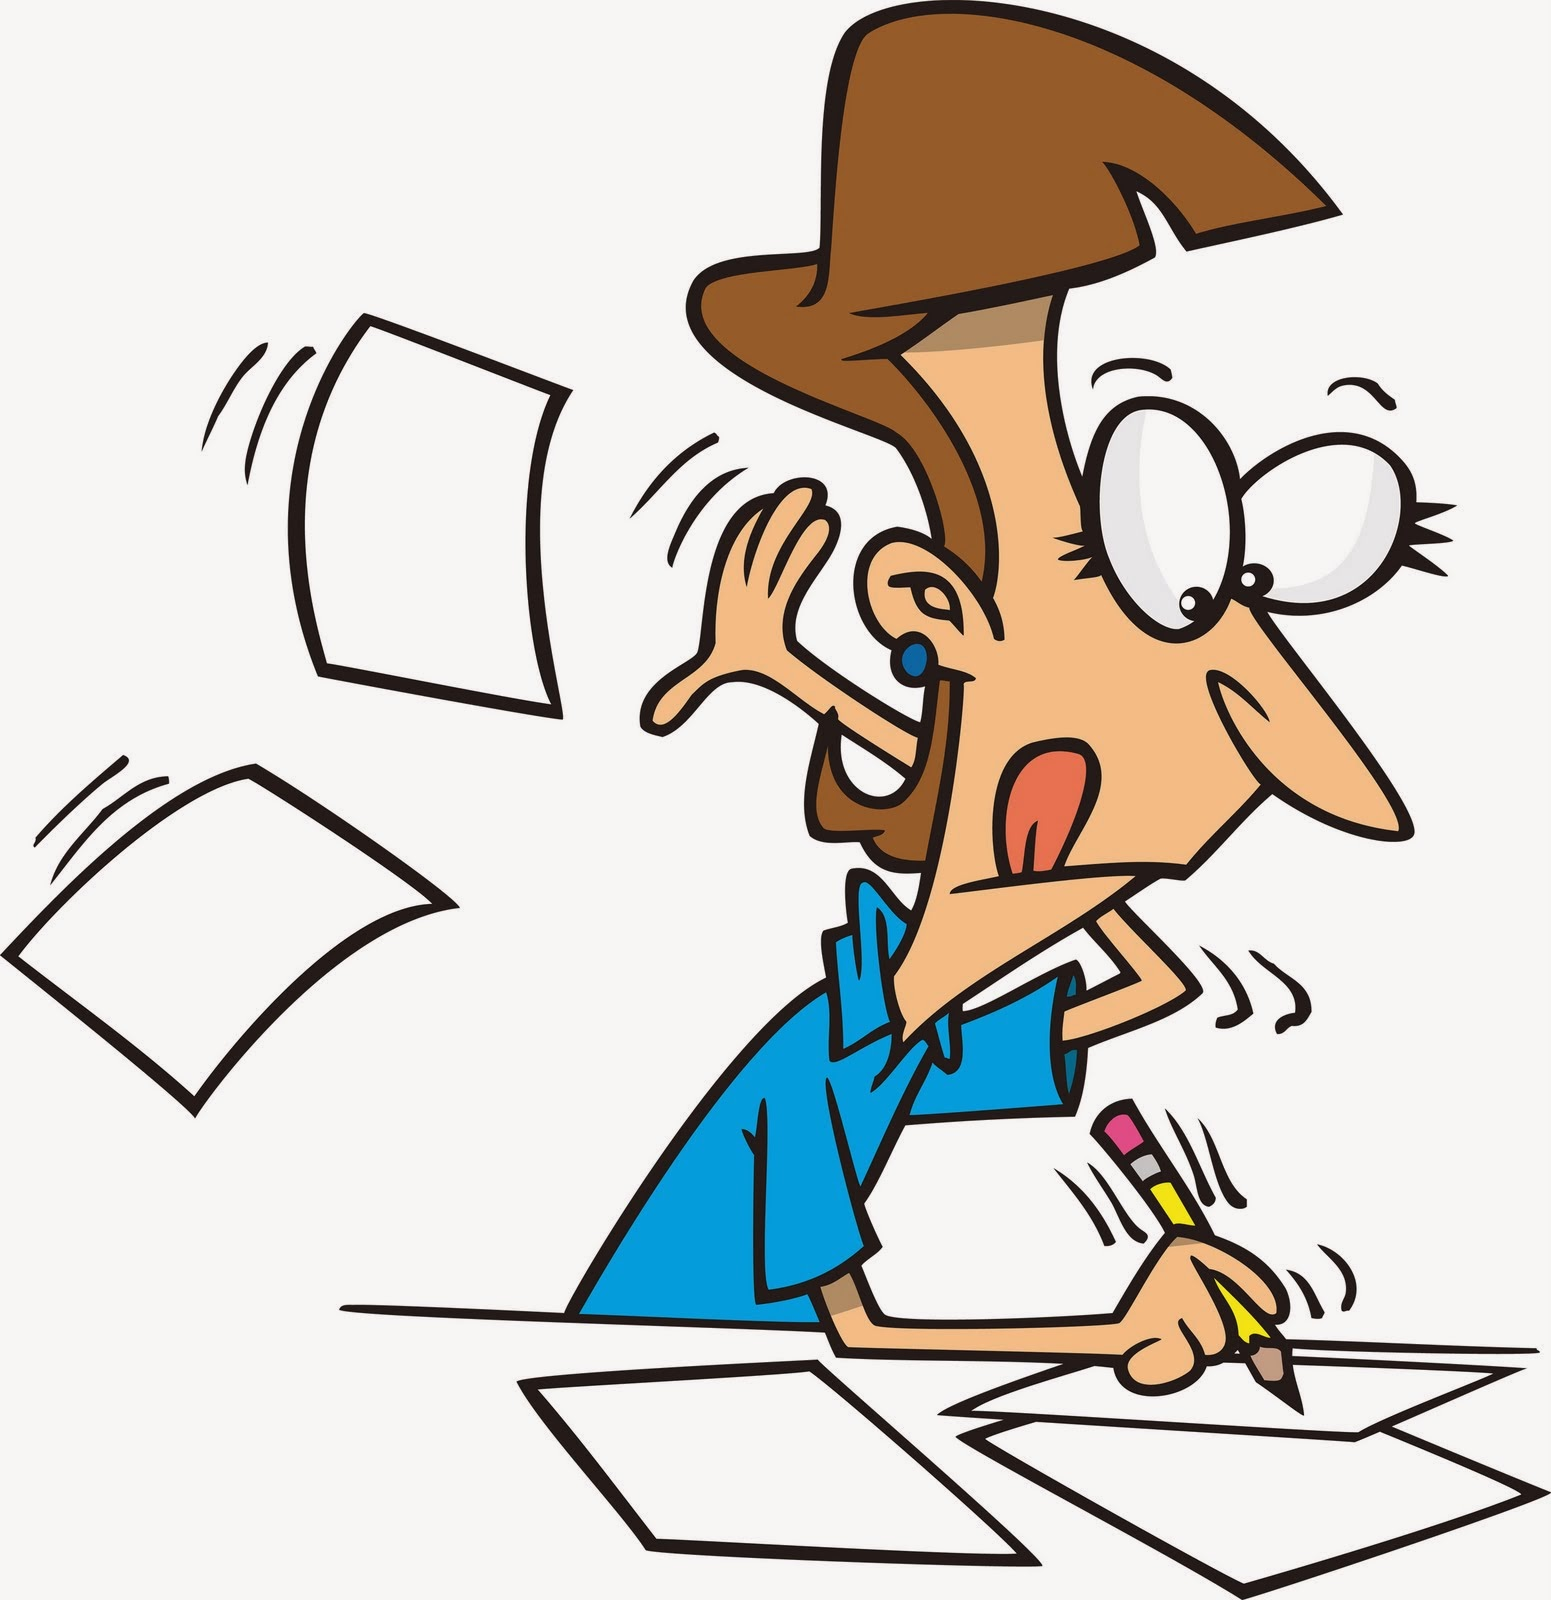 Statement of Purpose, Personal Statement & Study Plan